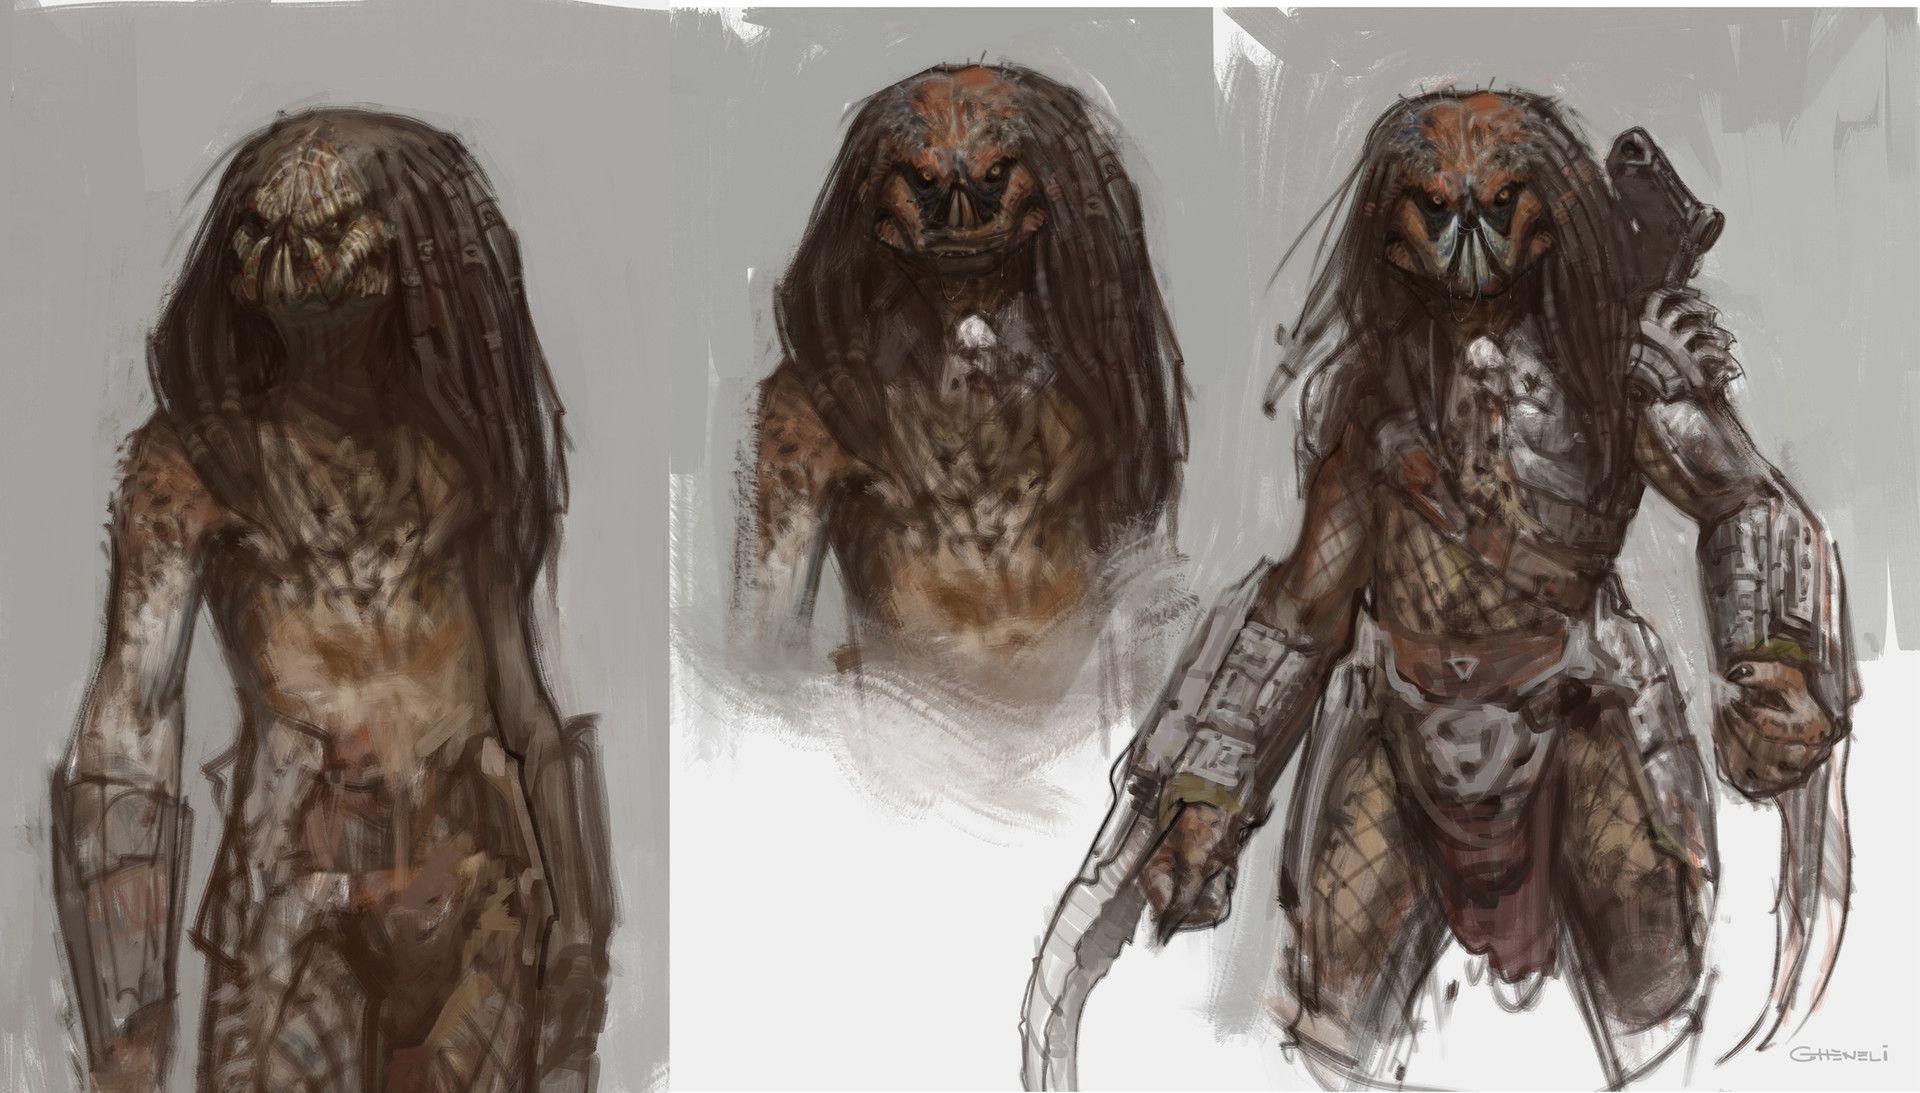 ArtStation - Predator sketches, Vlad Gheneli